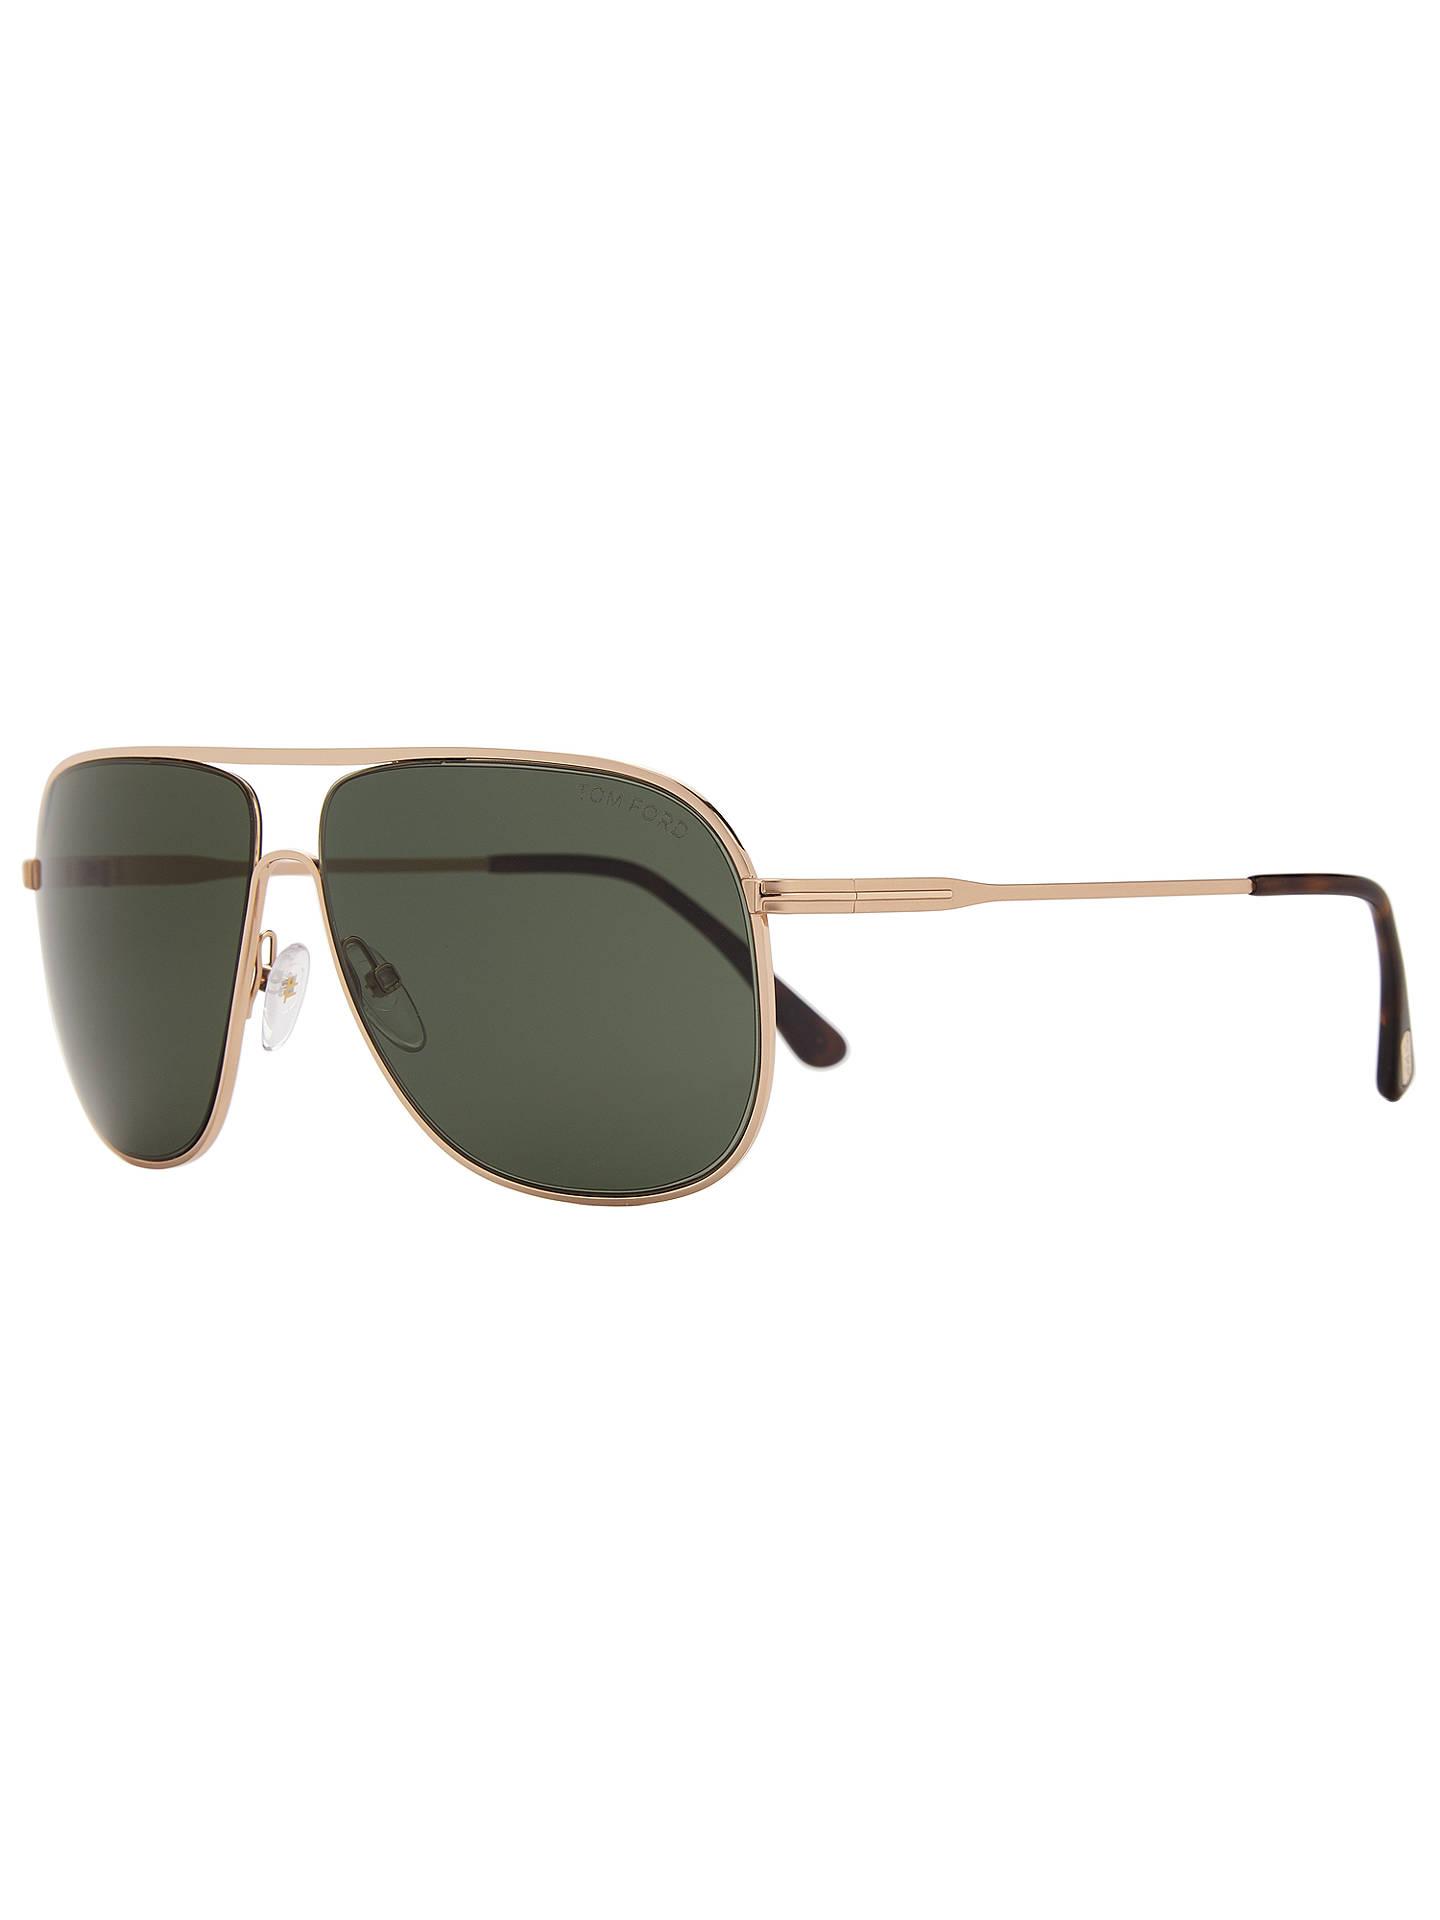 682d653cc4 TOM FORD FT0451 Dominic Aviator Sunglasses at John Lewis   Partners